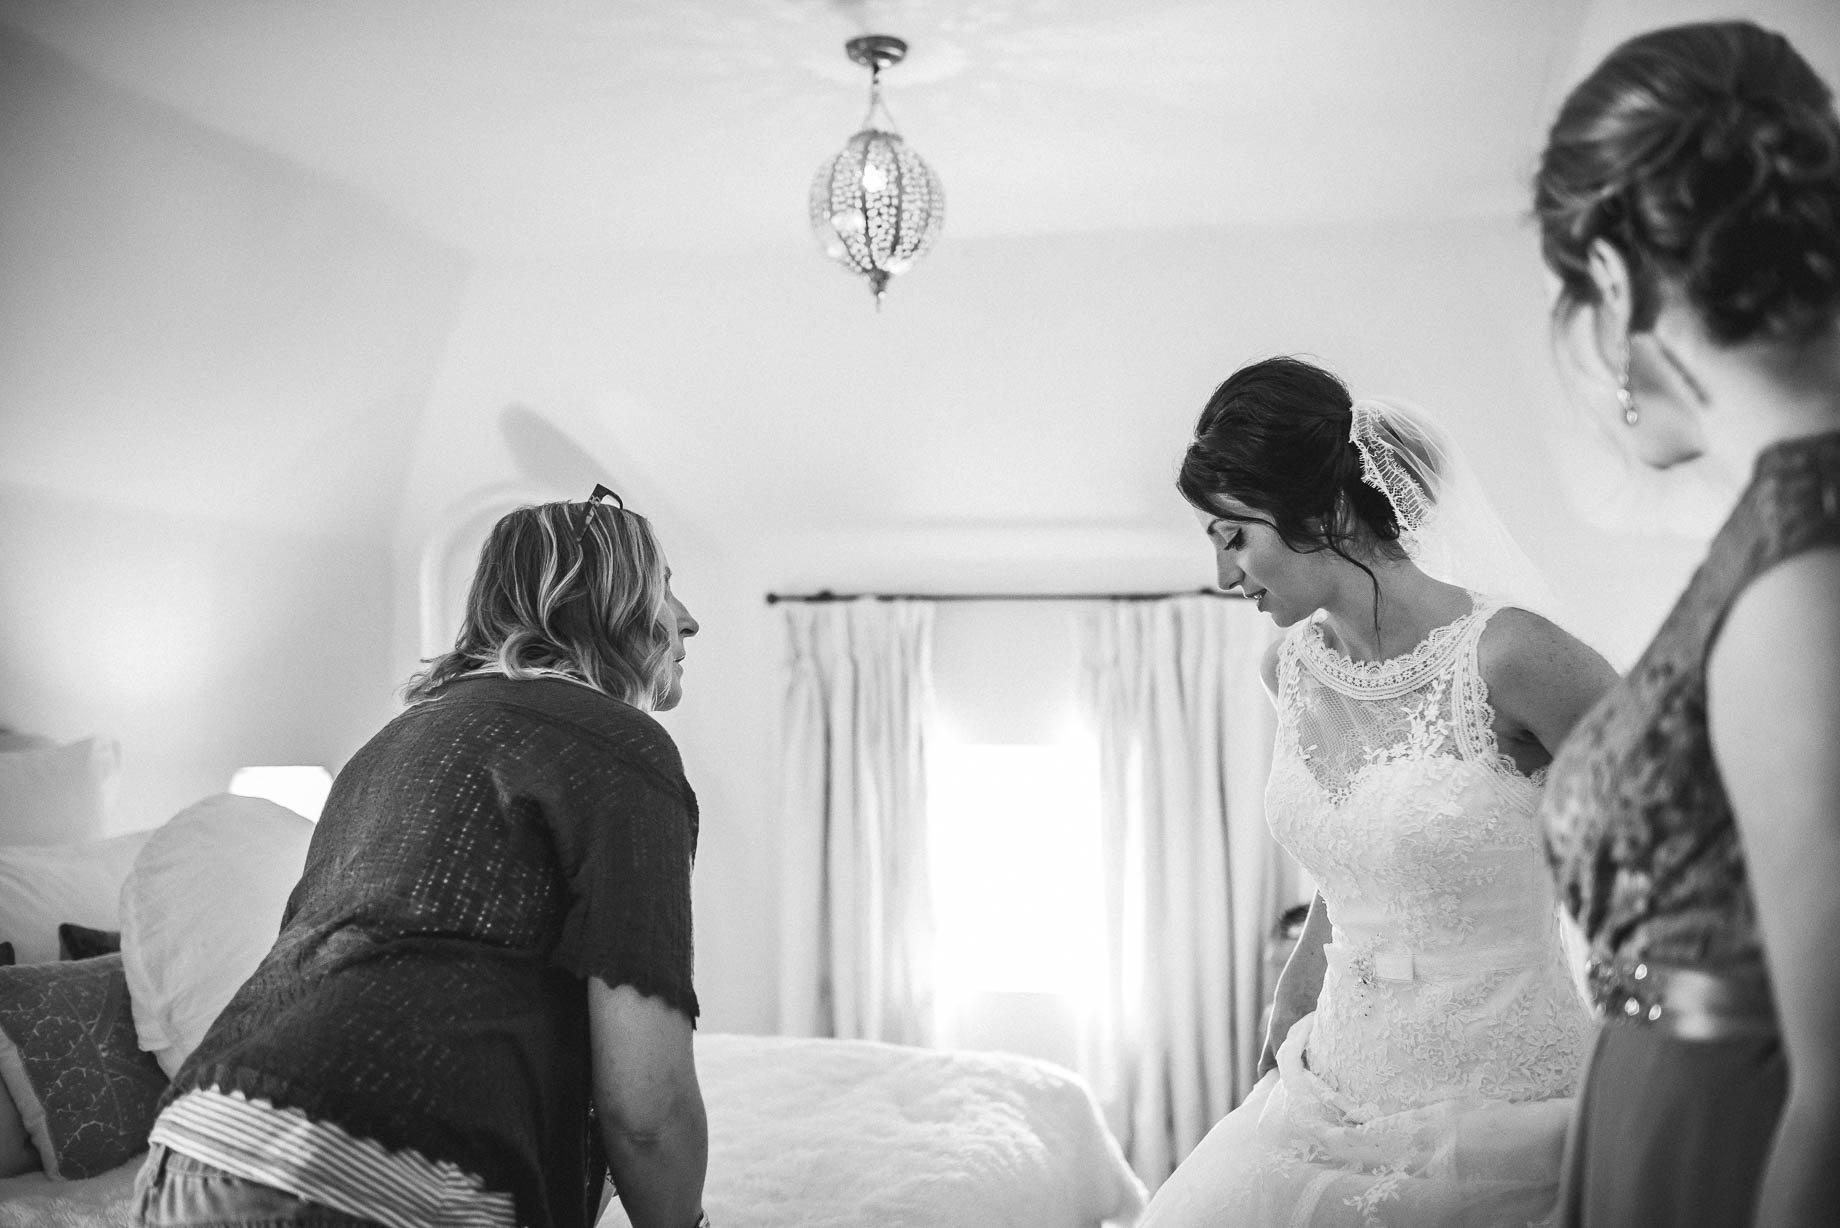 Gaynes Park wedding photography - Guy Collier Photography - Rachel and Jon (49 of 169)